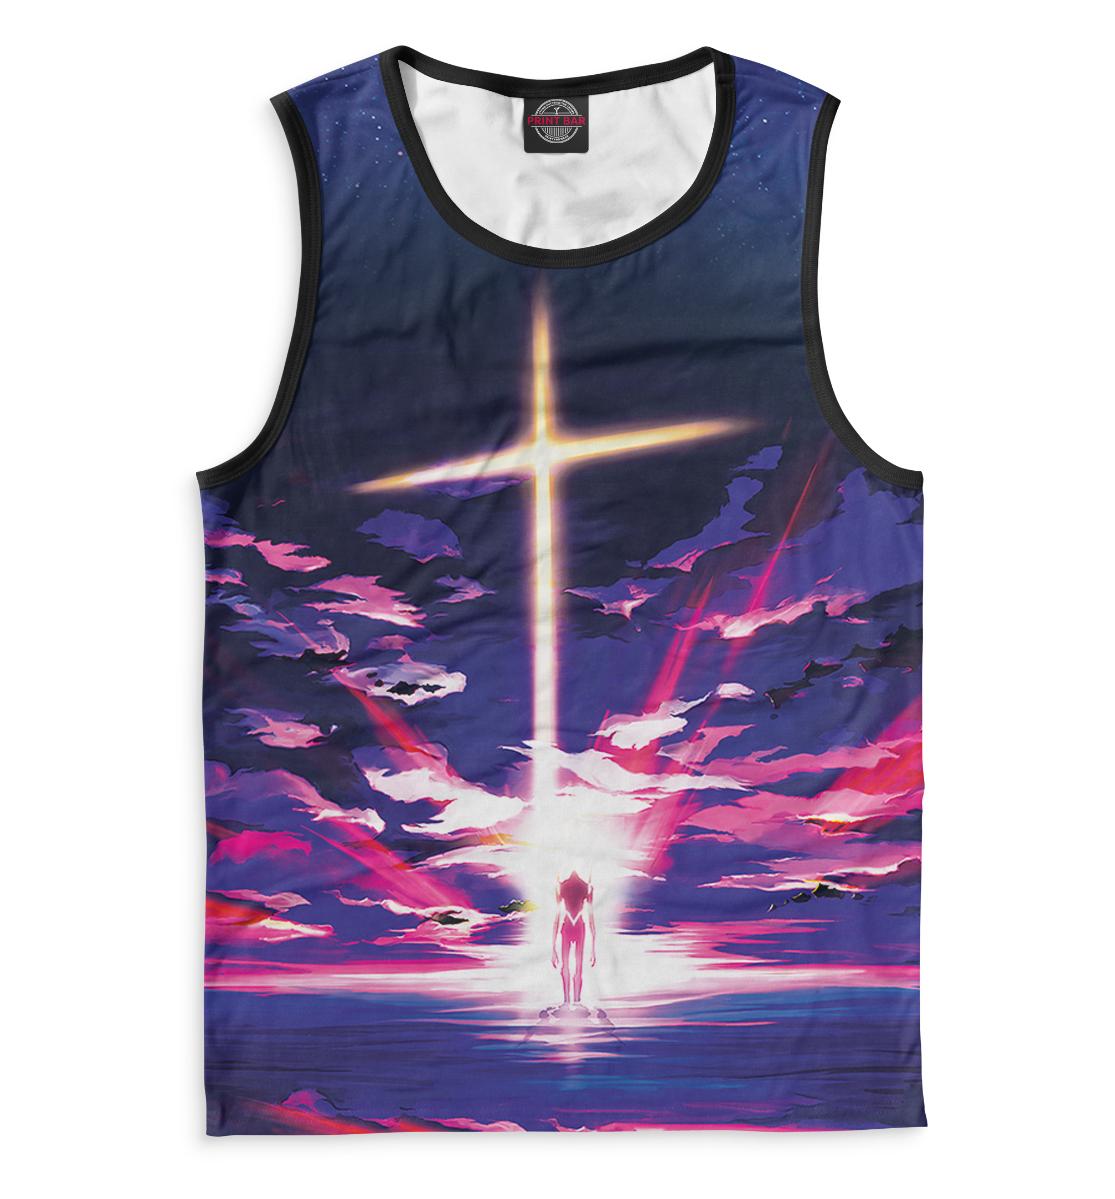 Купить Neon Genesis Evangelion, Printbar, Майки, EVA-534396-may-2